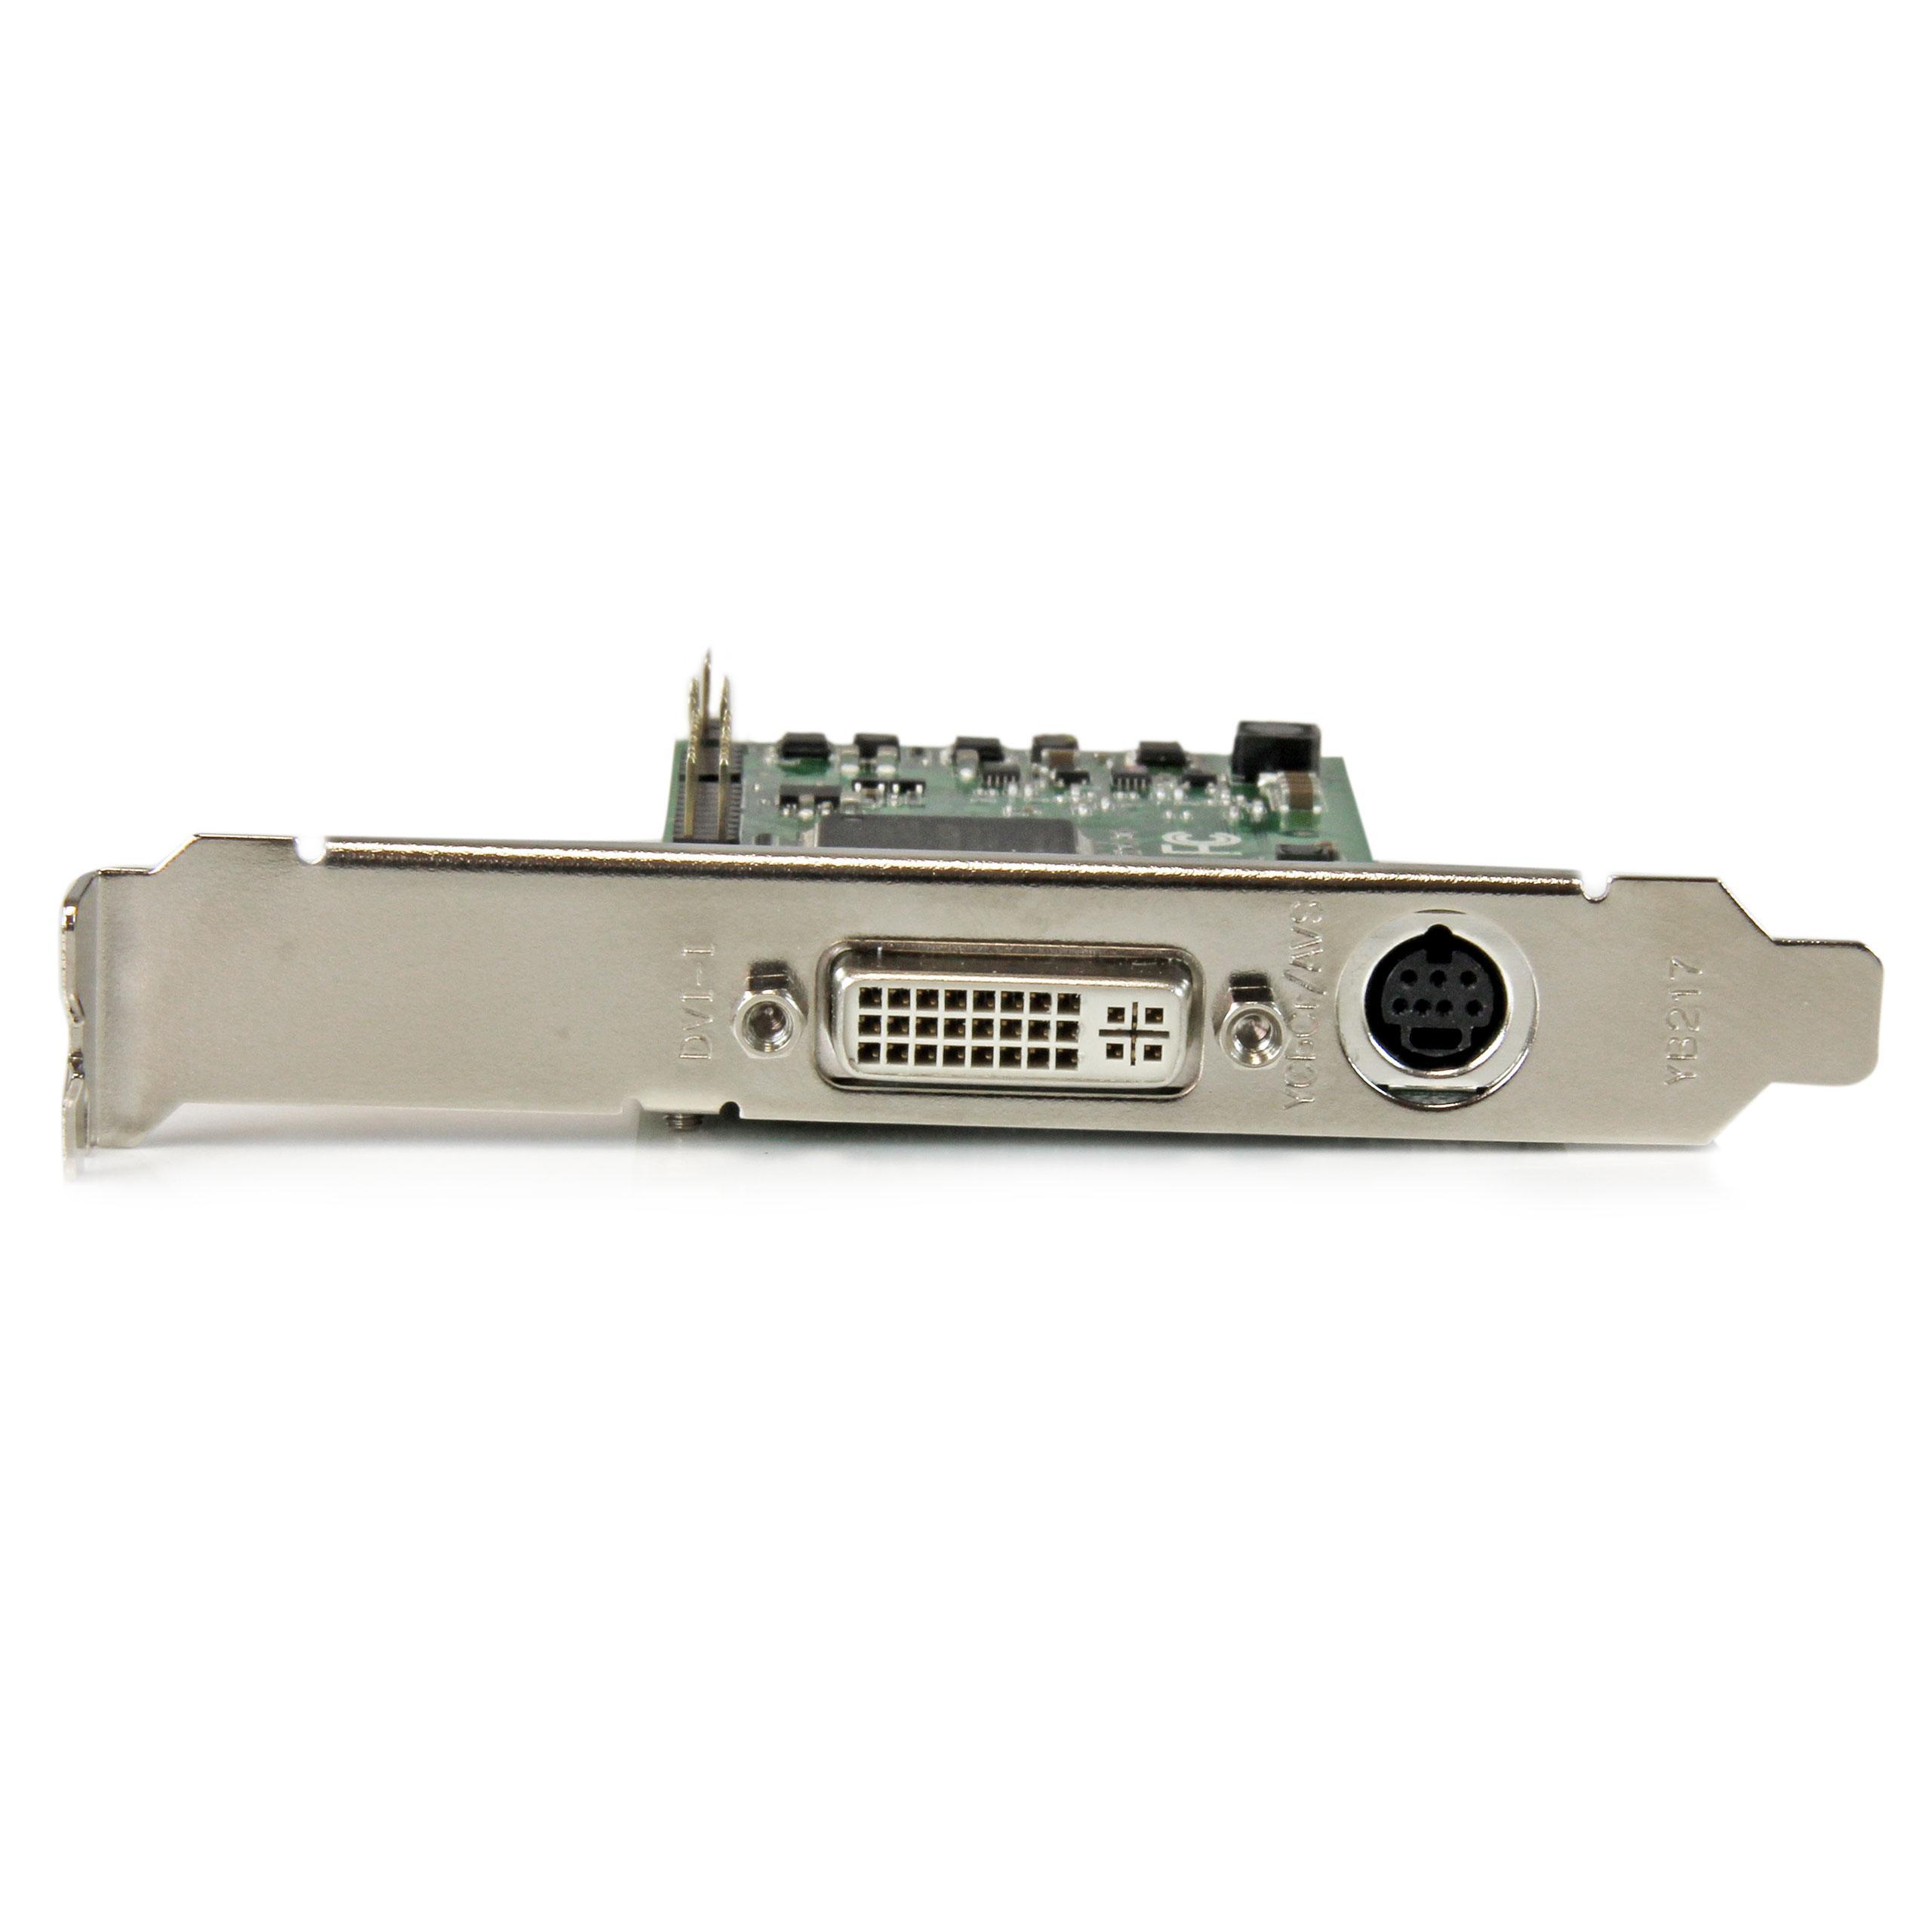 StarTech.com PCIe Video Capture Card - HDMI / DVID / VGA